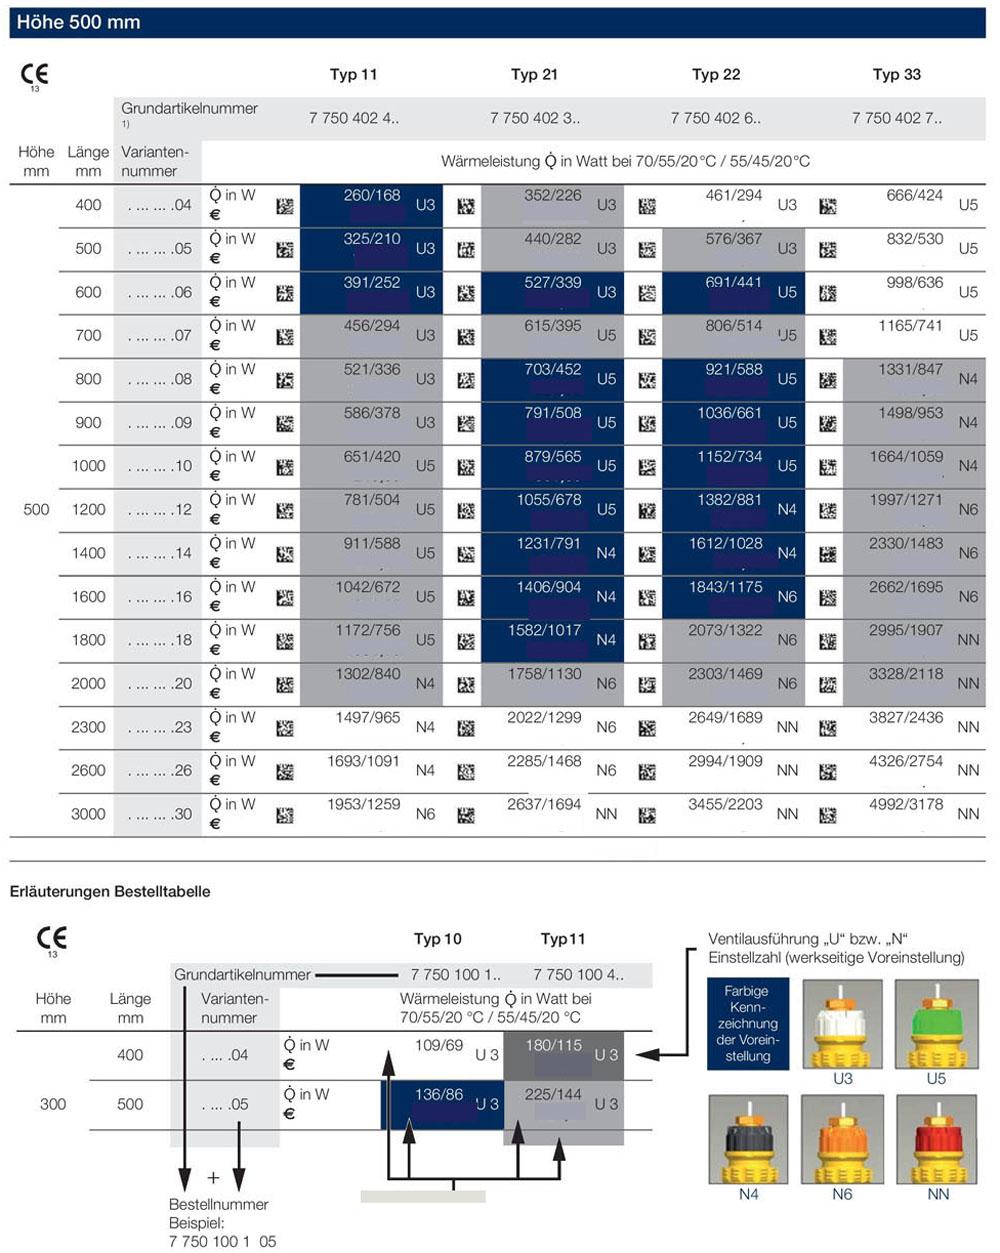 heizkrper watt tabelle trendy heizkrper watt tabelle with. Black Bedroom Furniture Sets. Home Design Ideas